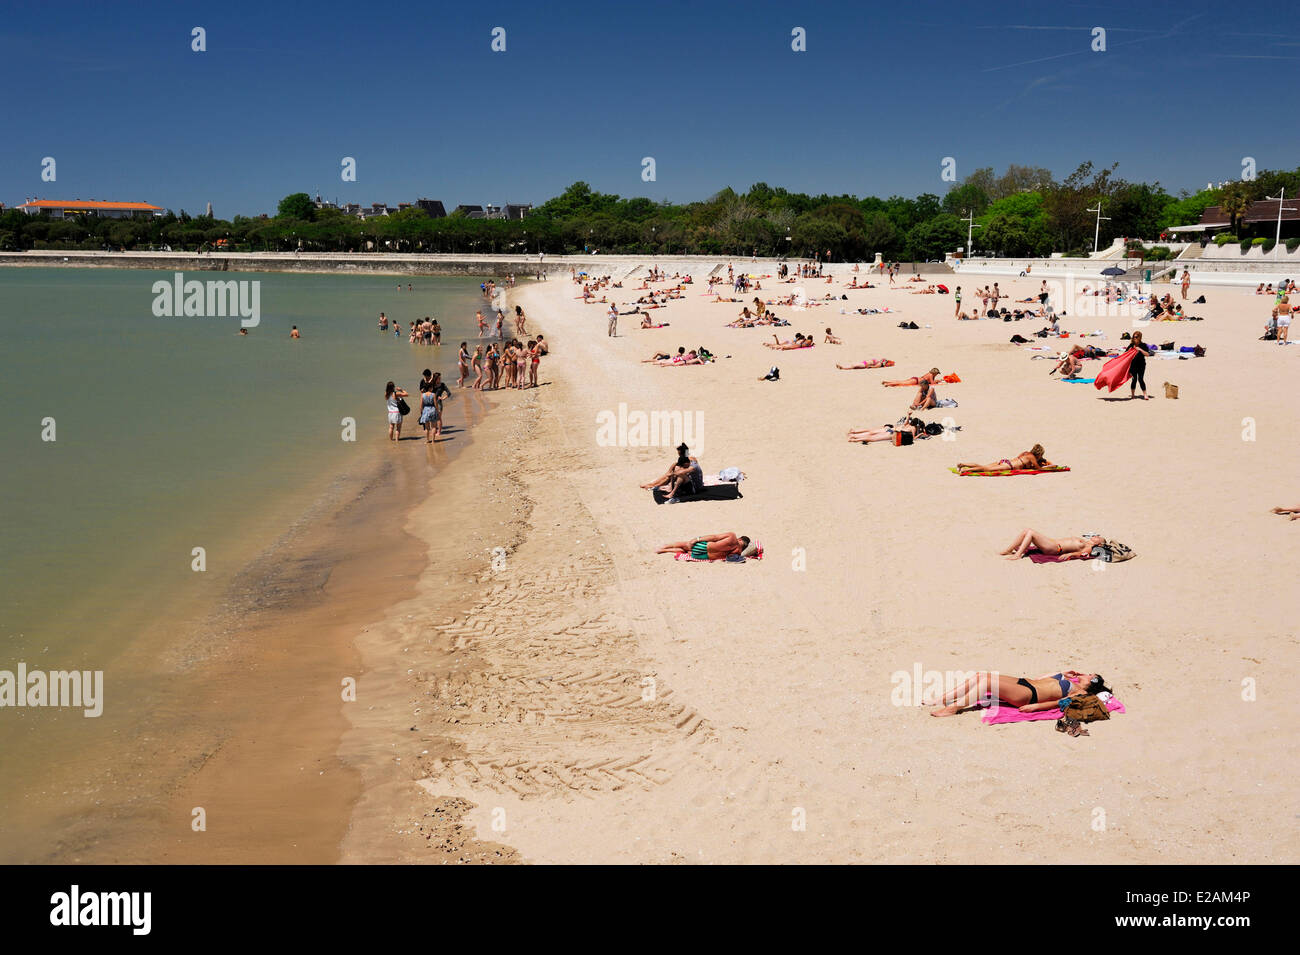 France, Charente Maritime, La Rochelle, tourists on the Plage de la Concurrence (Concurrence Beach) - Stock Image